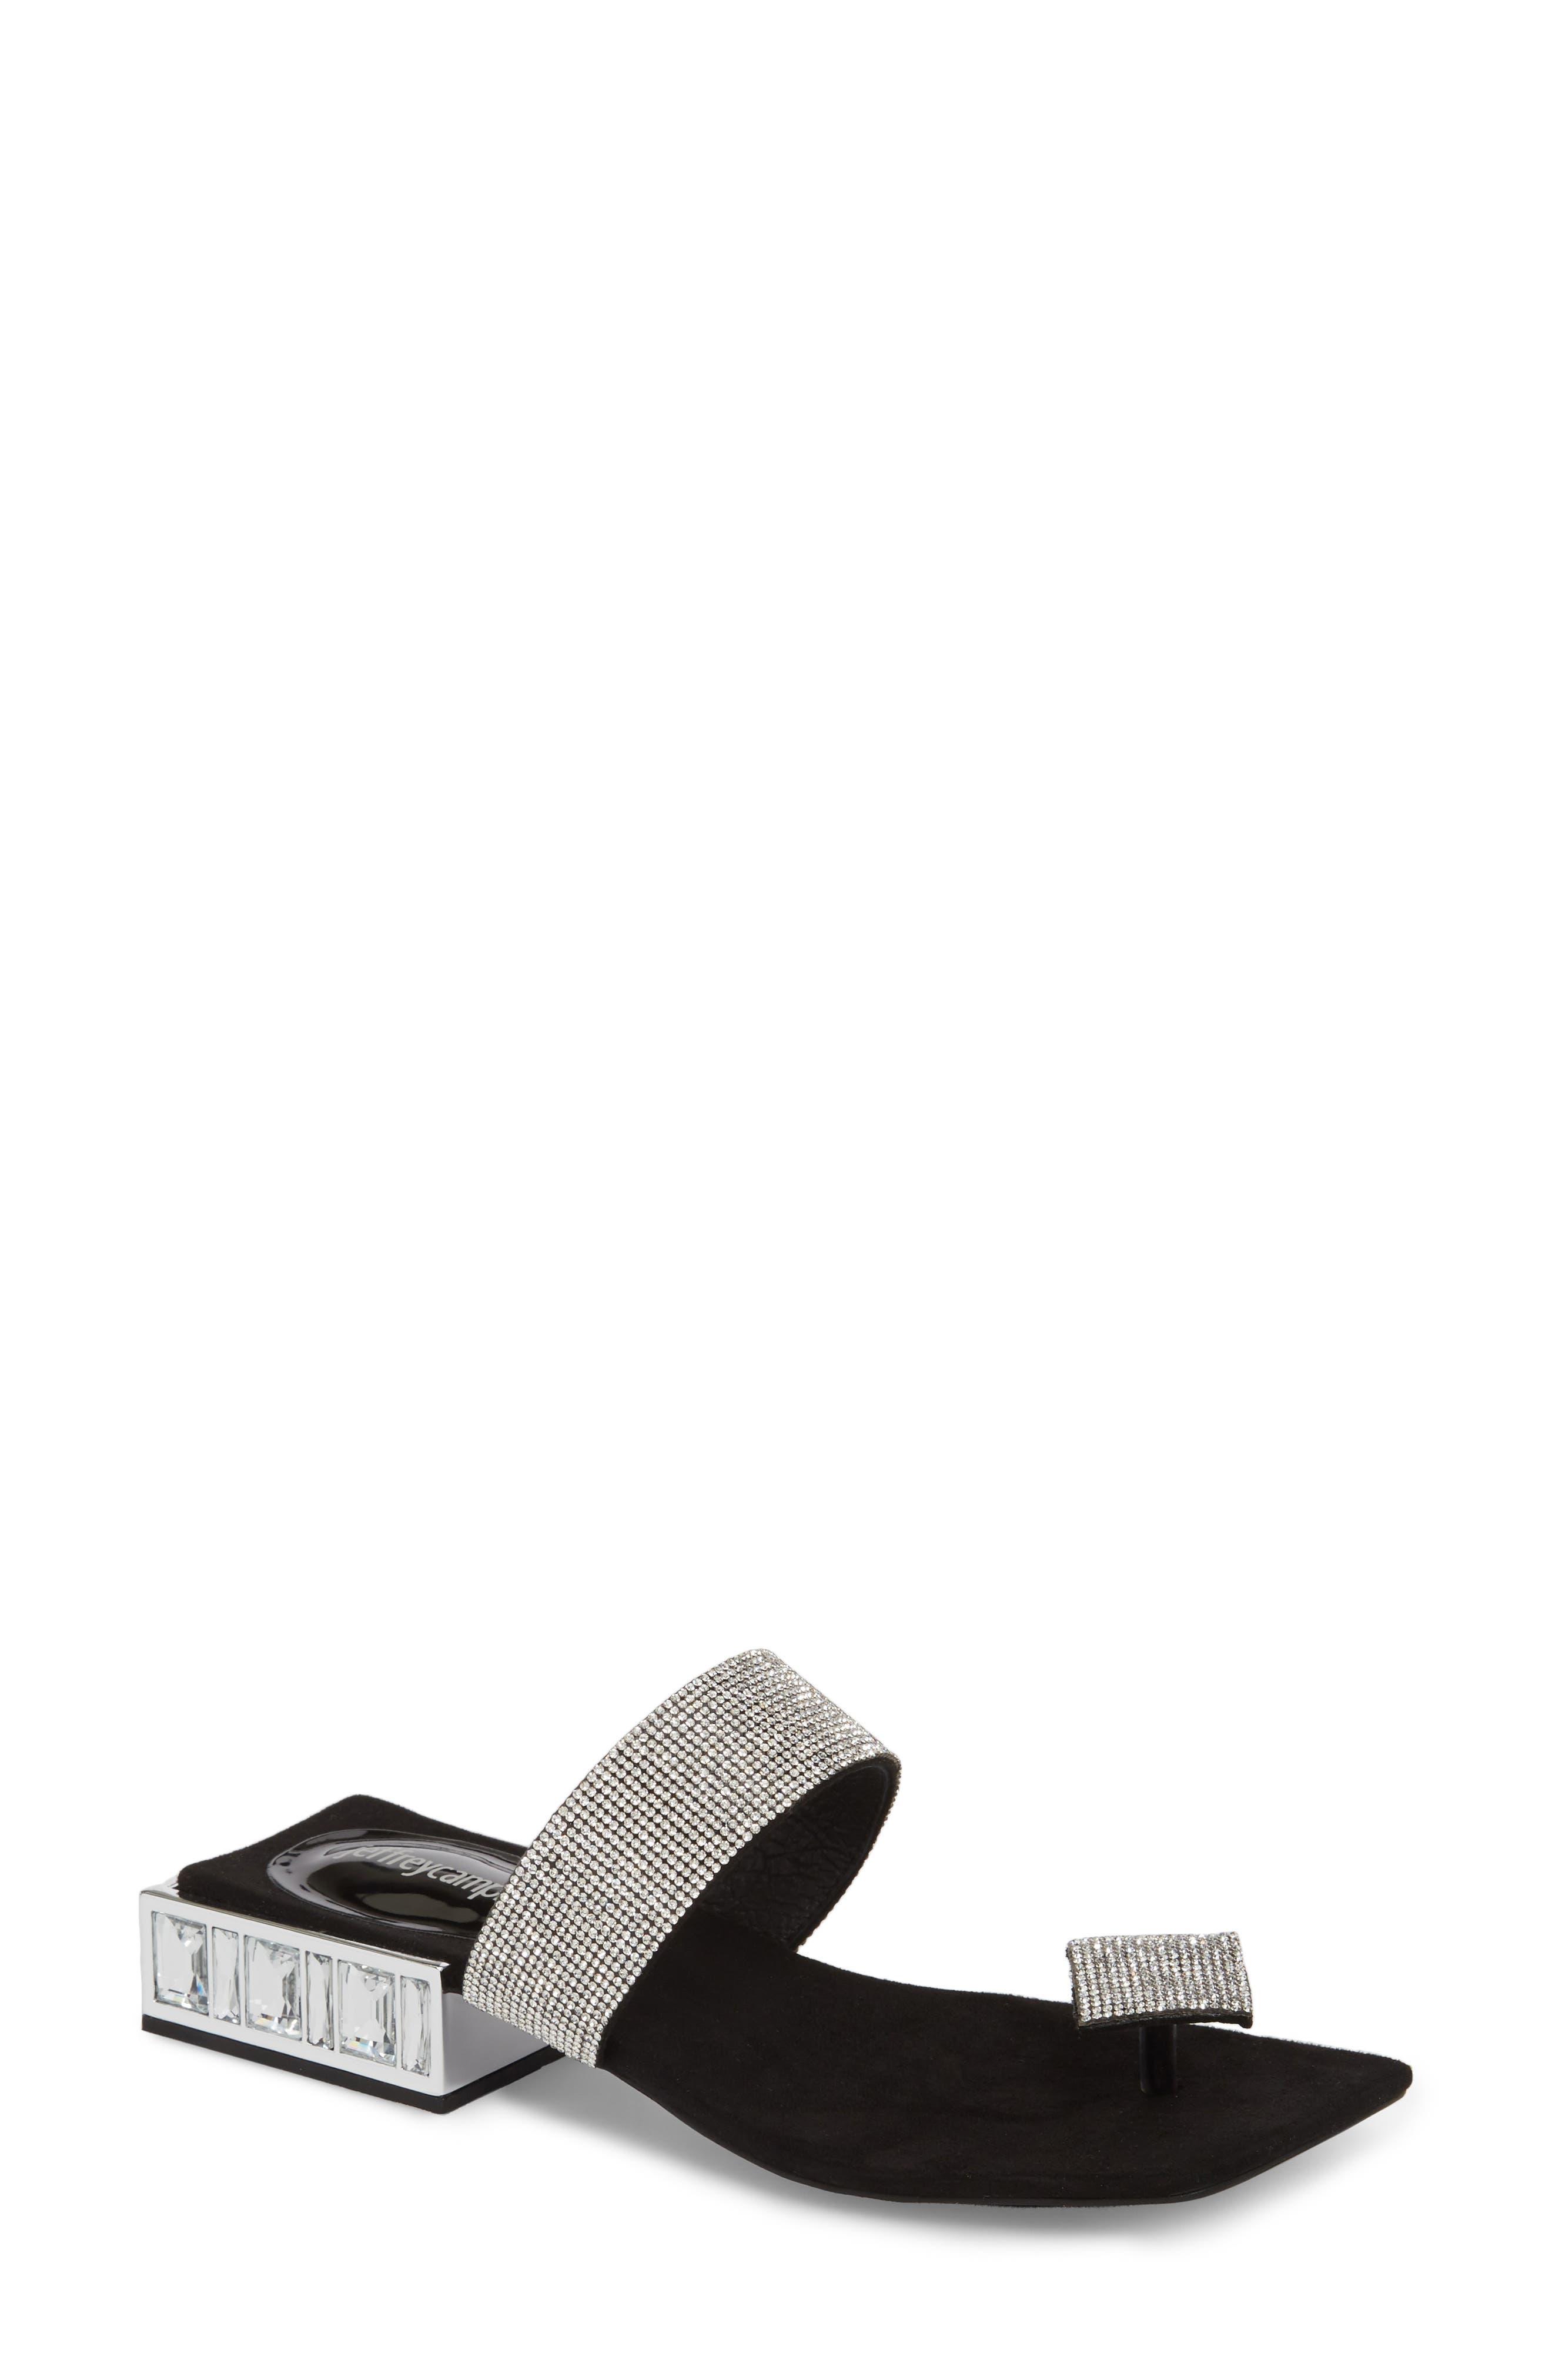 JEFFREY CAMPBELL, Alise Embellished Sandal, Main thumbnail 1, color, BLACK SUEDE/ SILVER